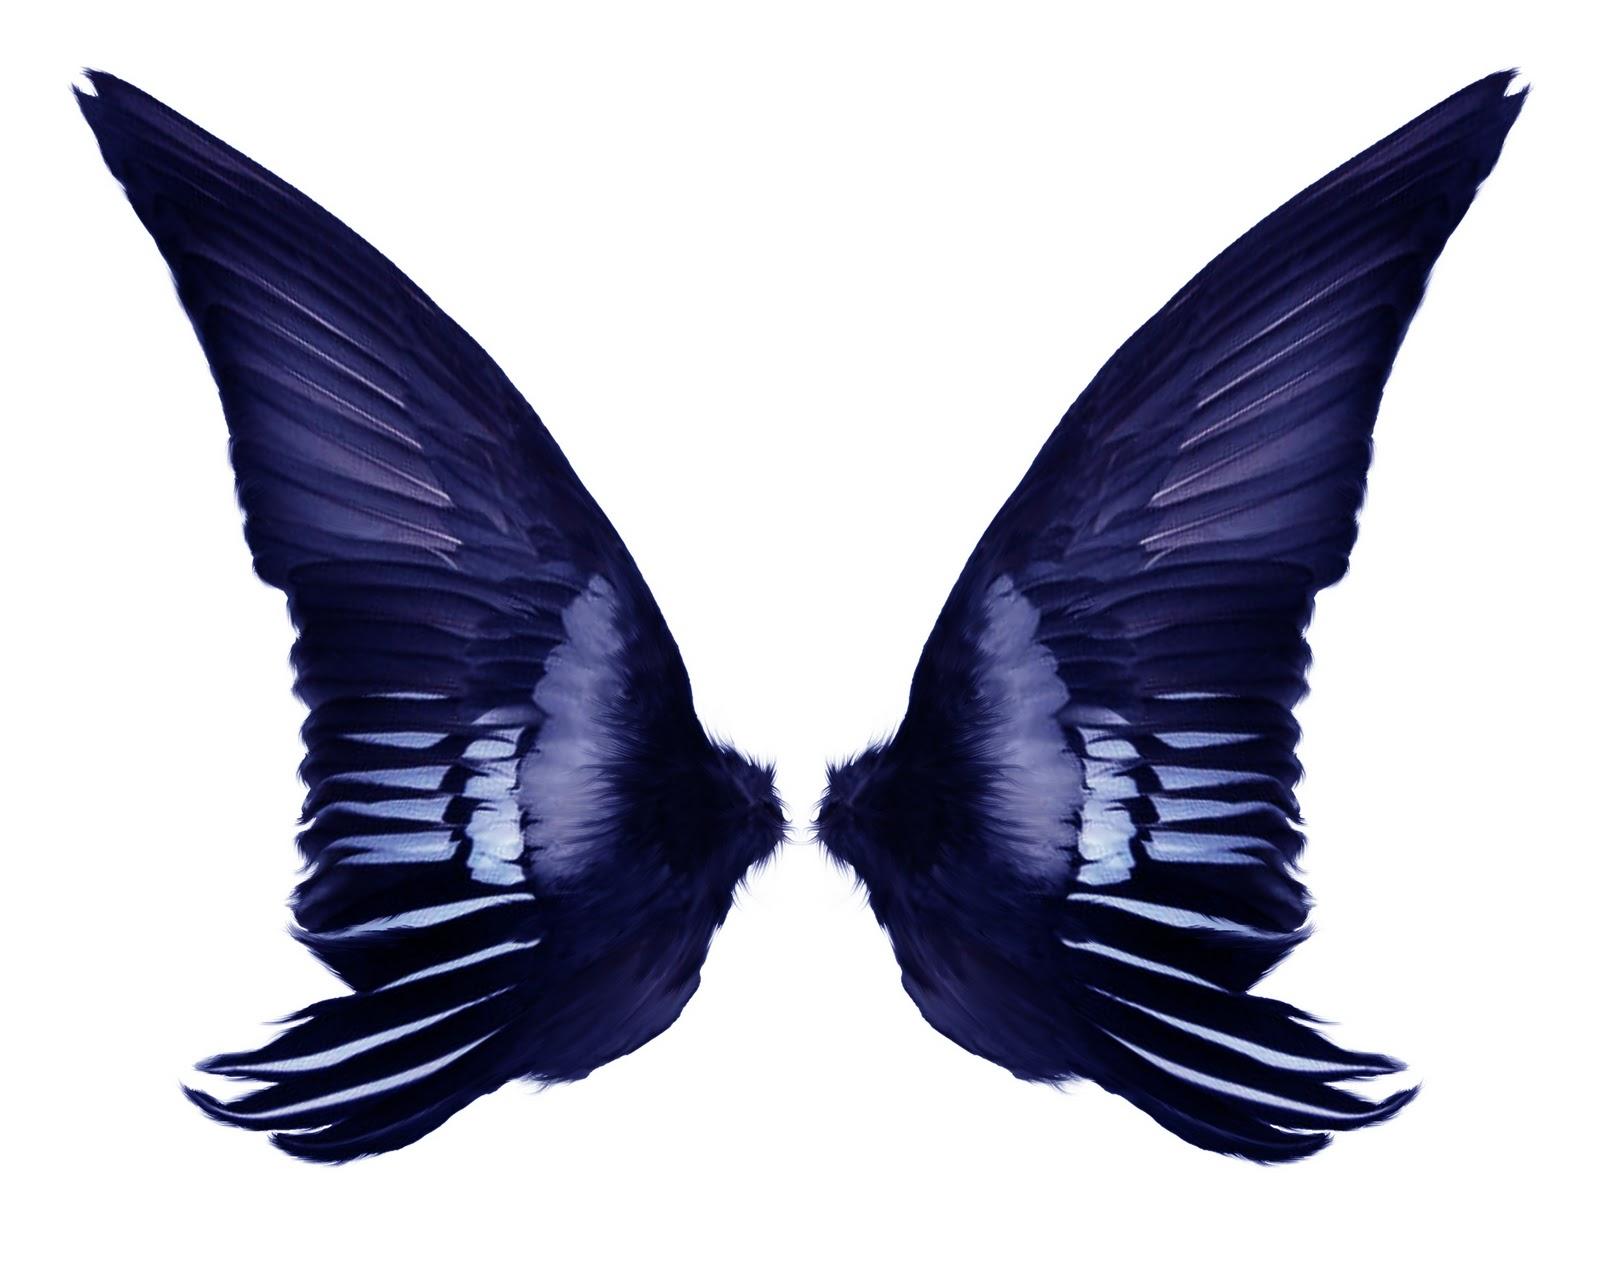 Psd Files Free Download: Dark wings, wings costume, black ...